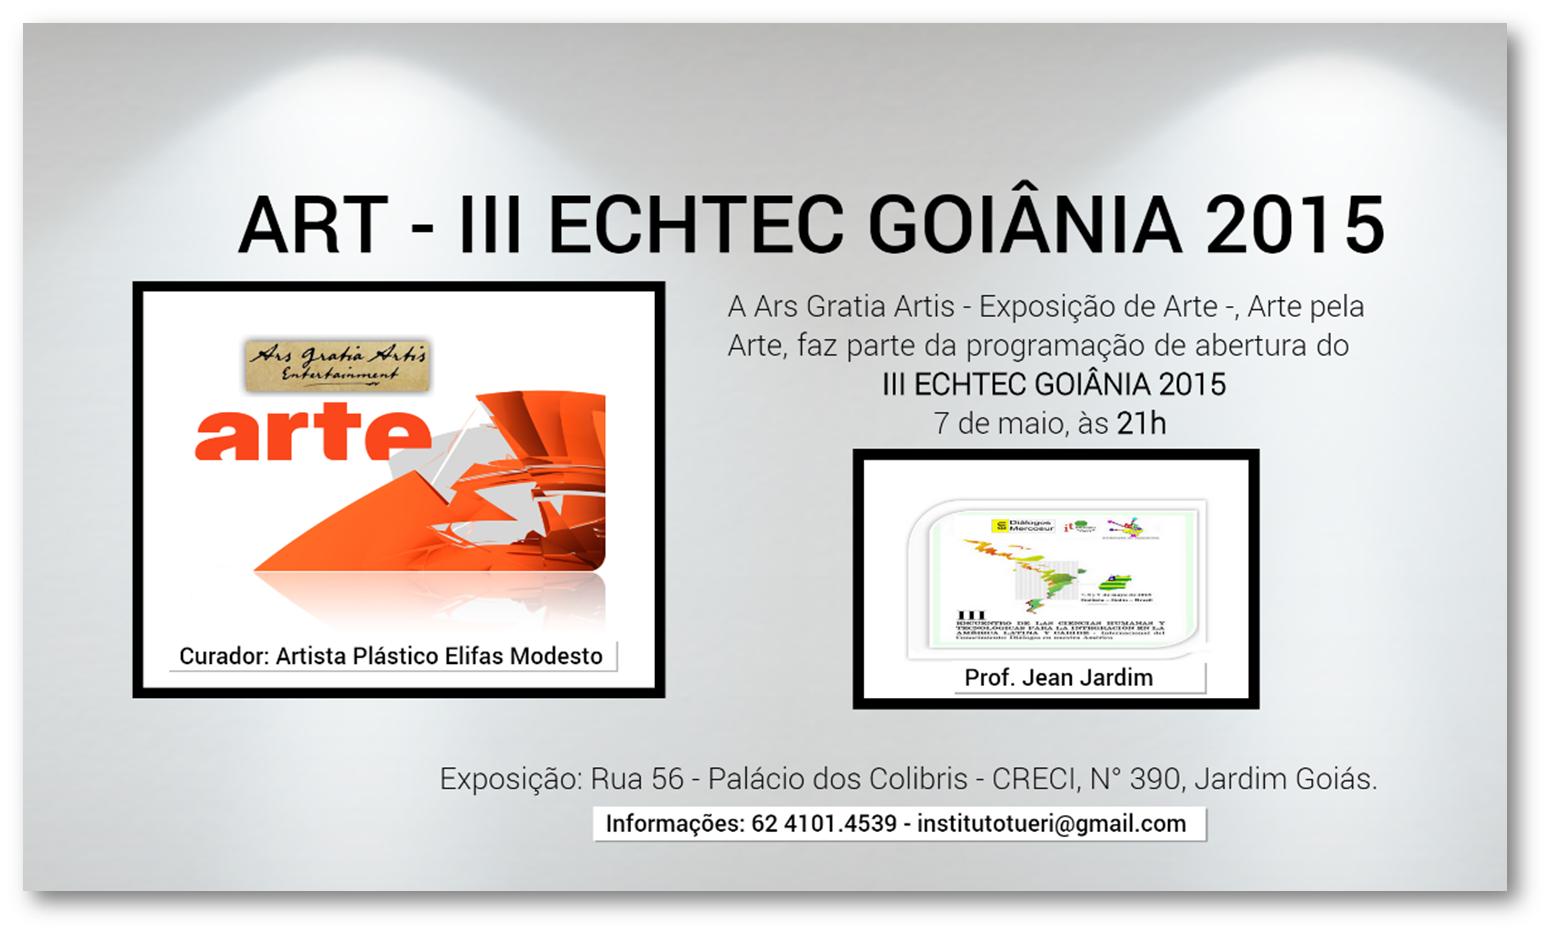 ART - III ECHTEC GOIÂNIA 2015